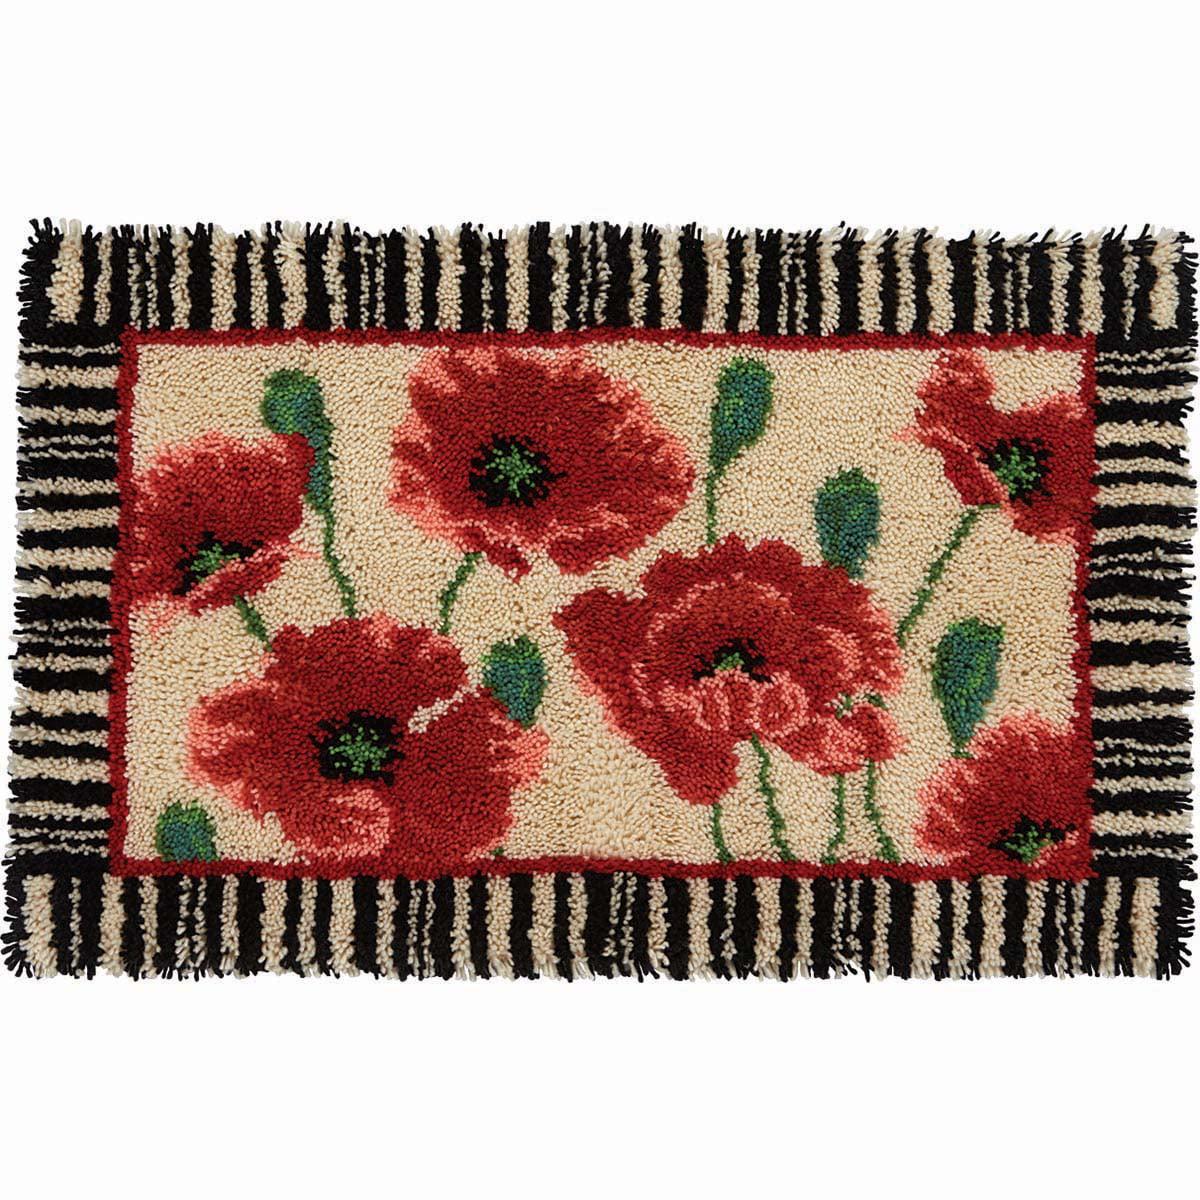 Herrschners® Poppies & Stripes Latch Hook Kit